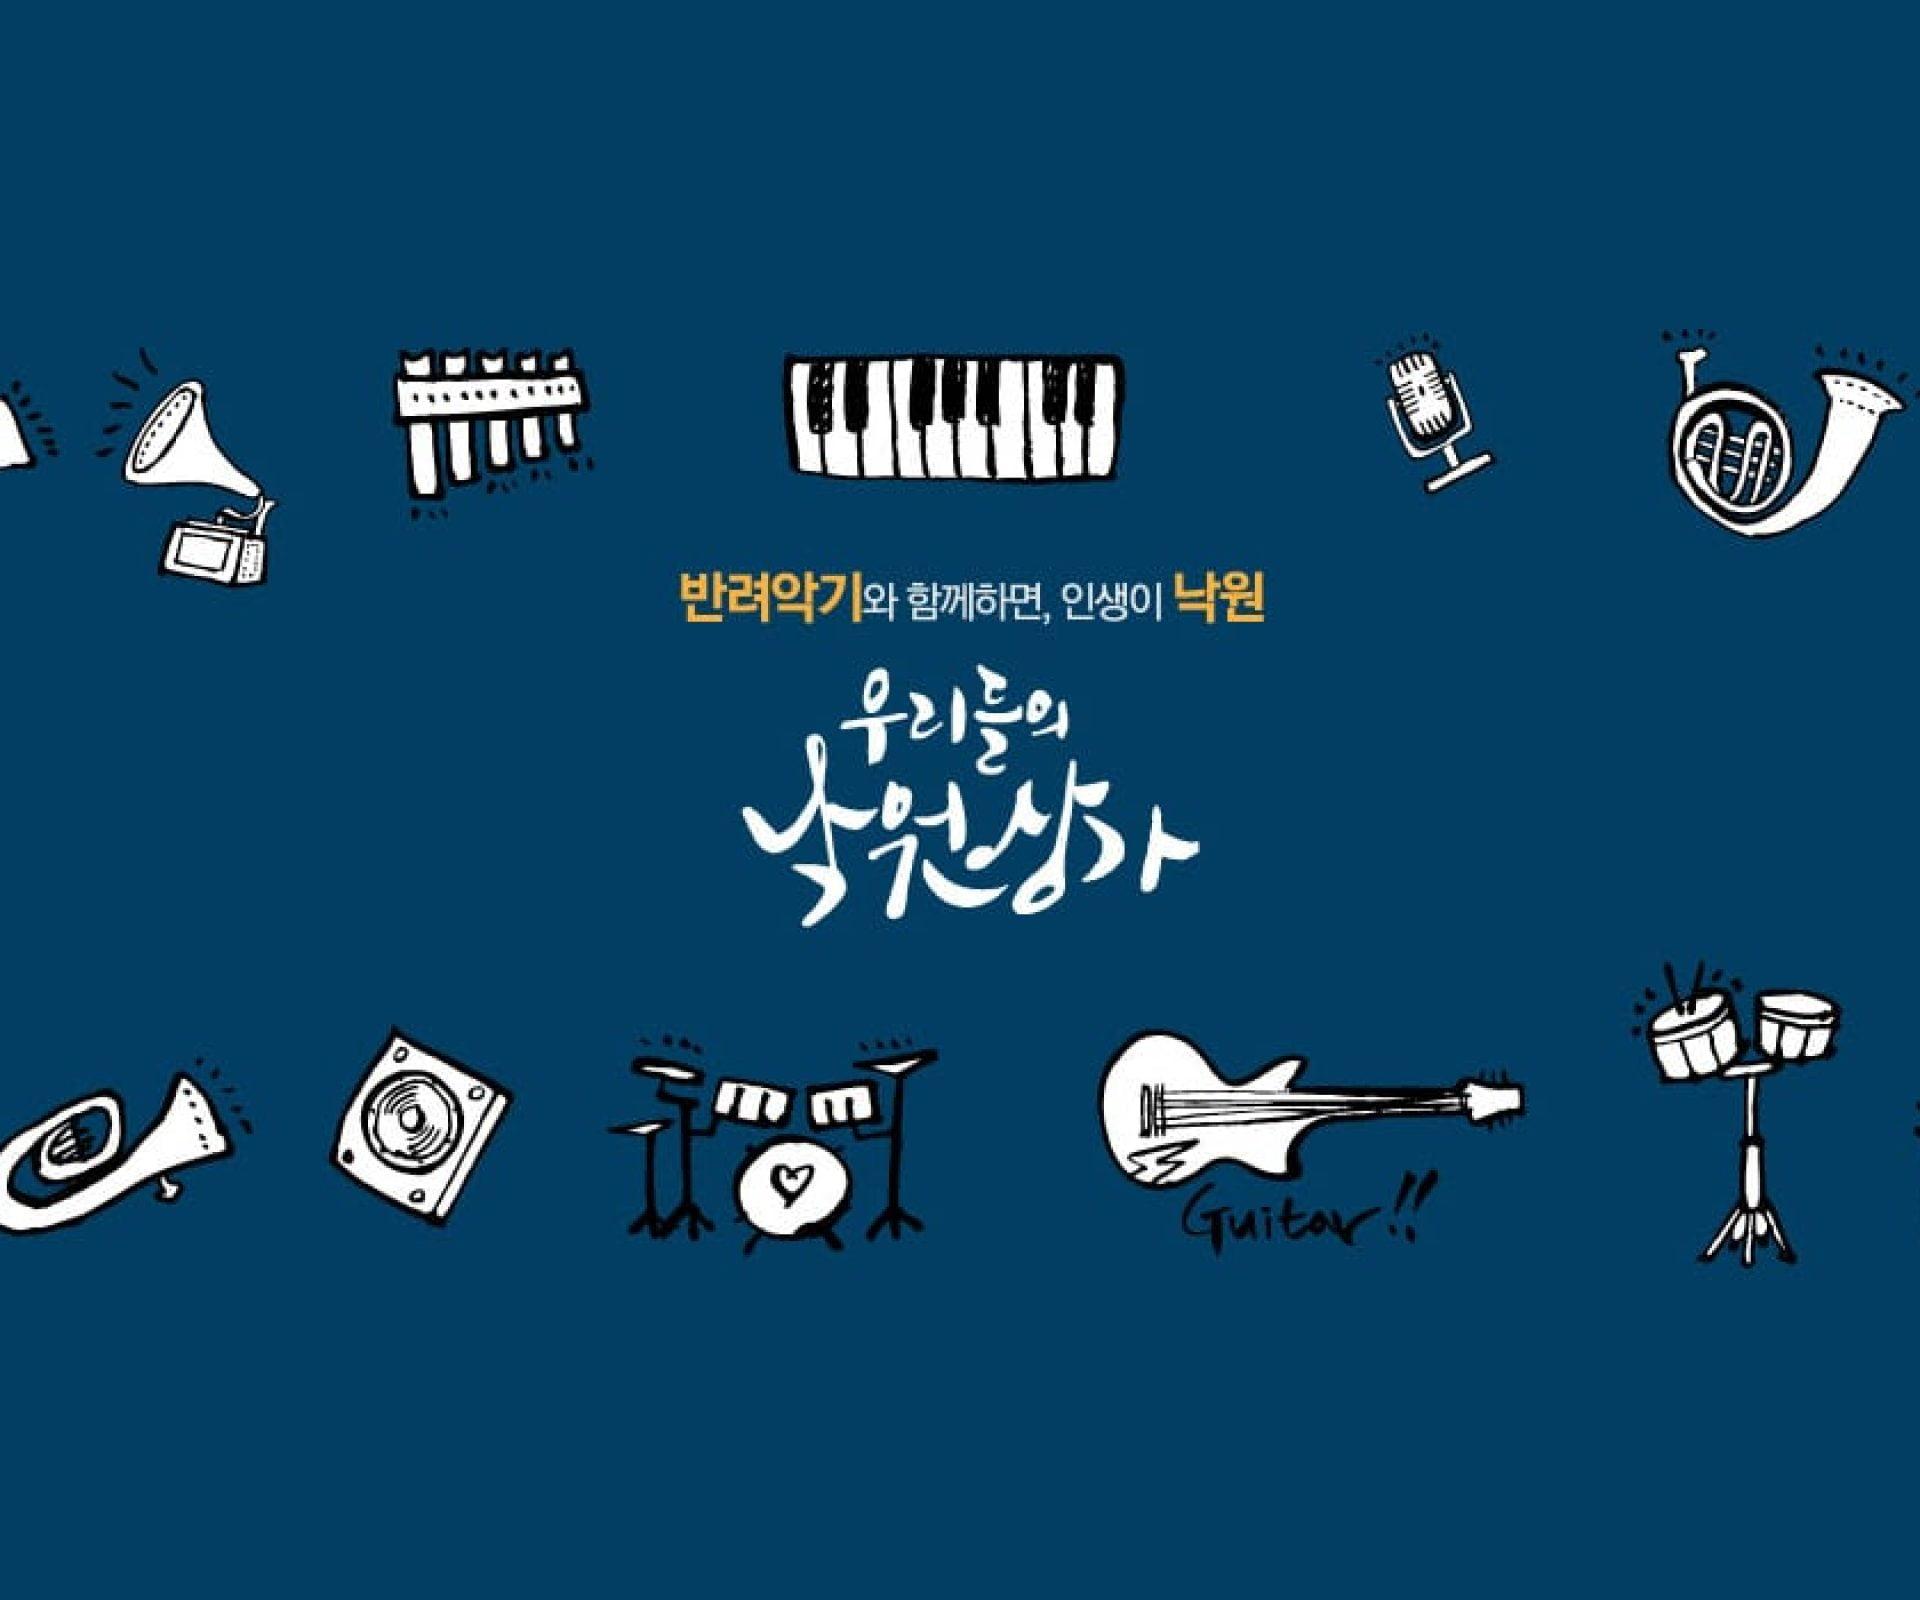 Nakwon Musical Instrument Arcade   Jongno-gu, Seoul